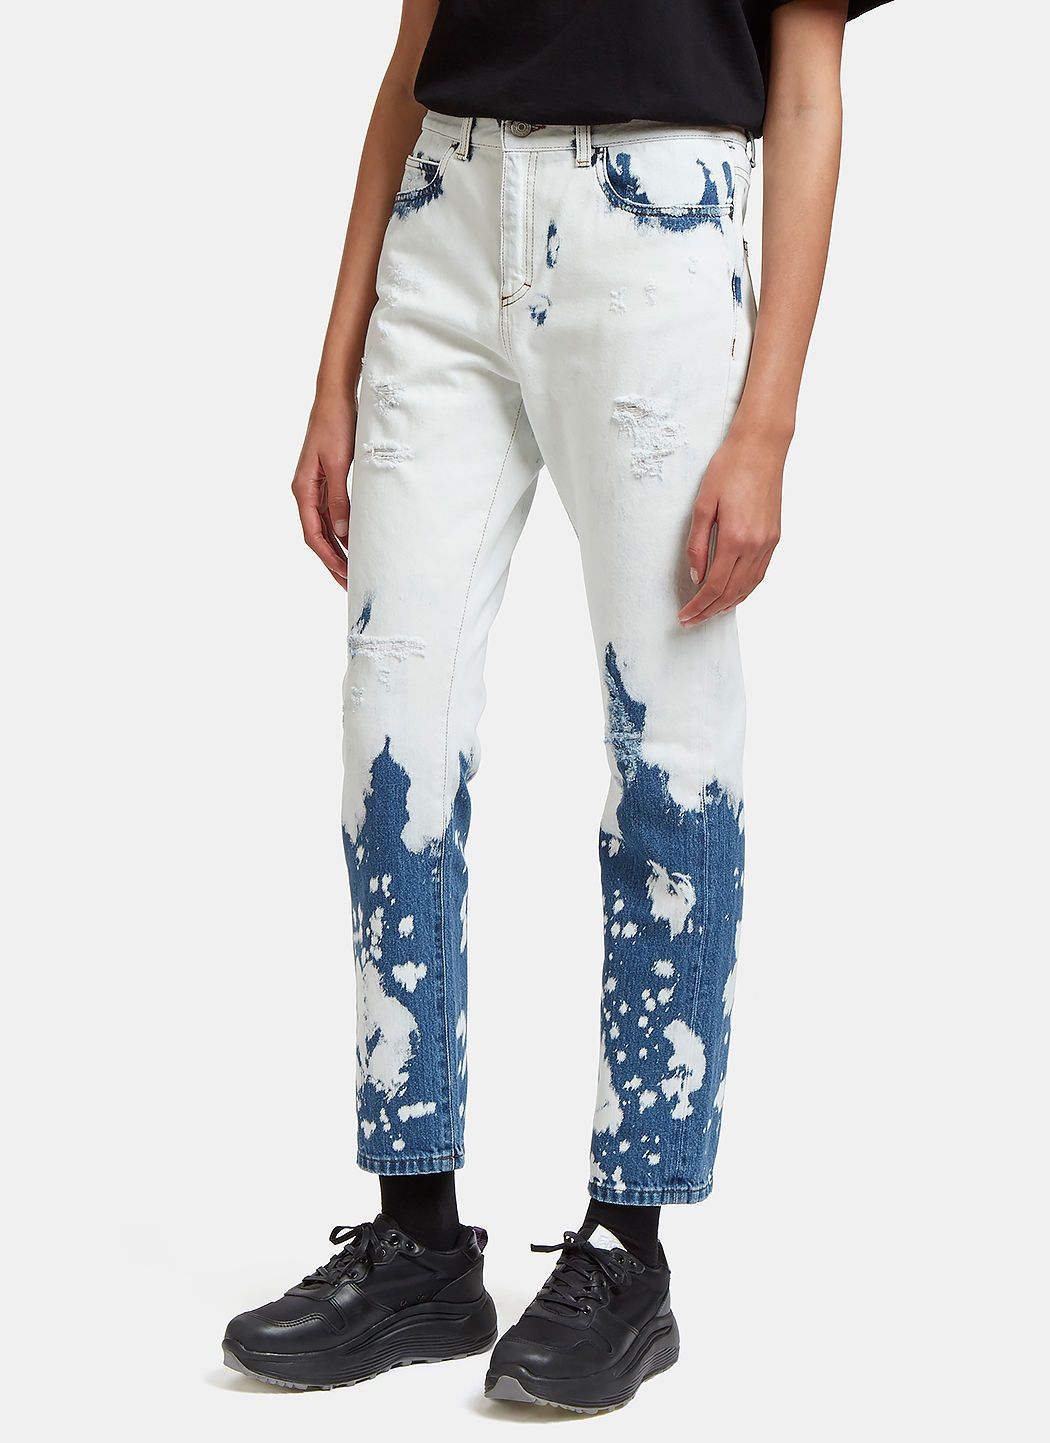 Bleached midrise boyfriend jeans in white bleach jeans